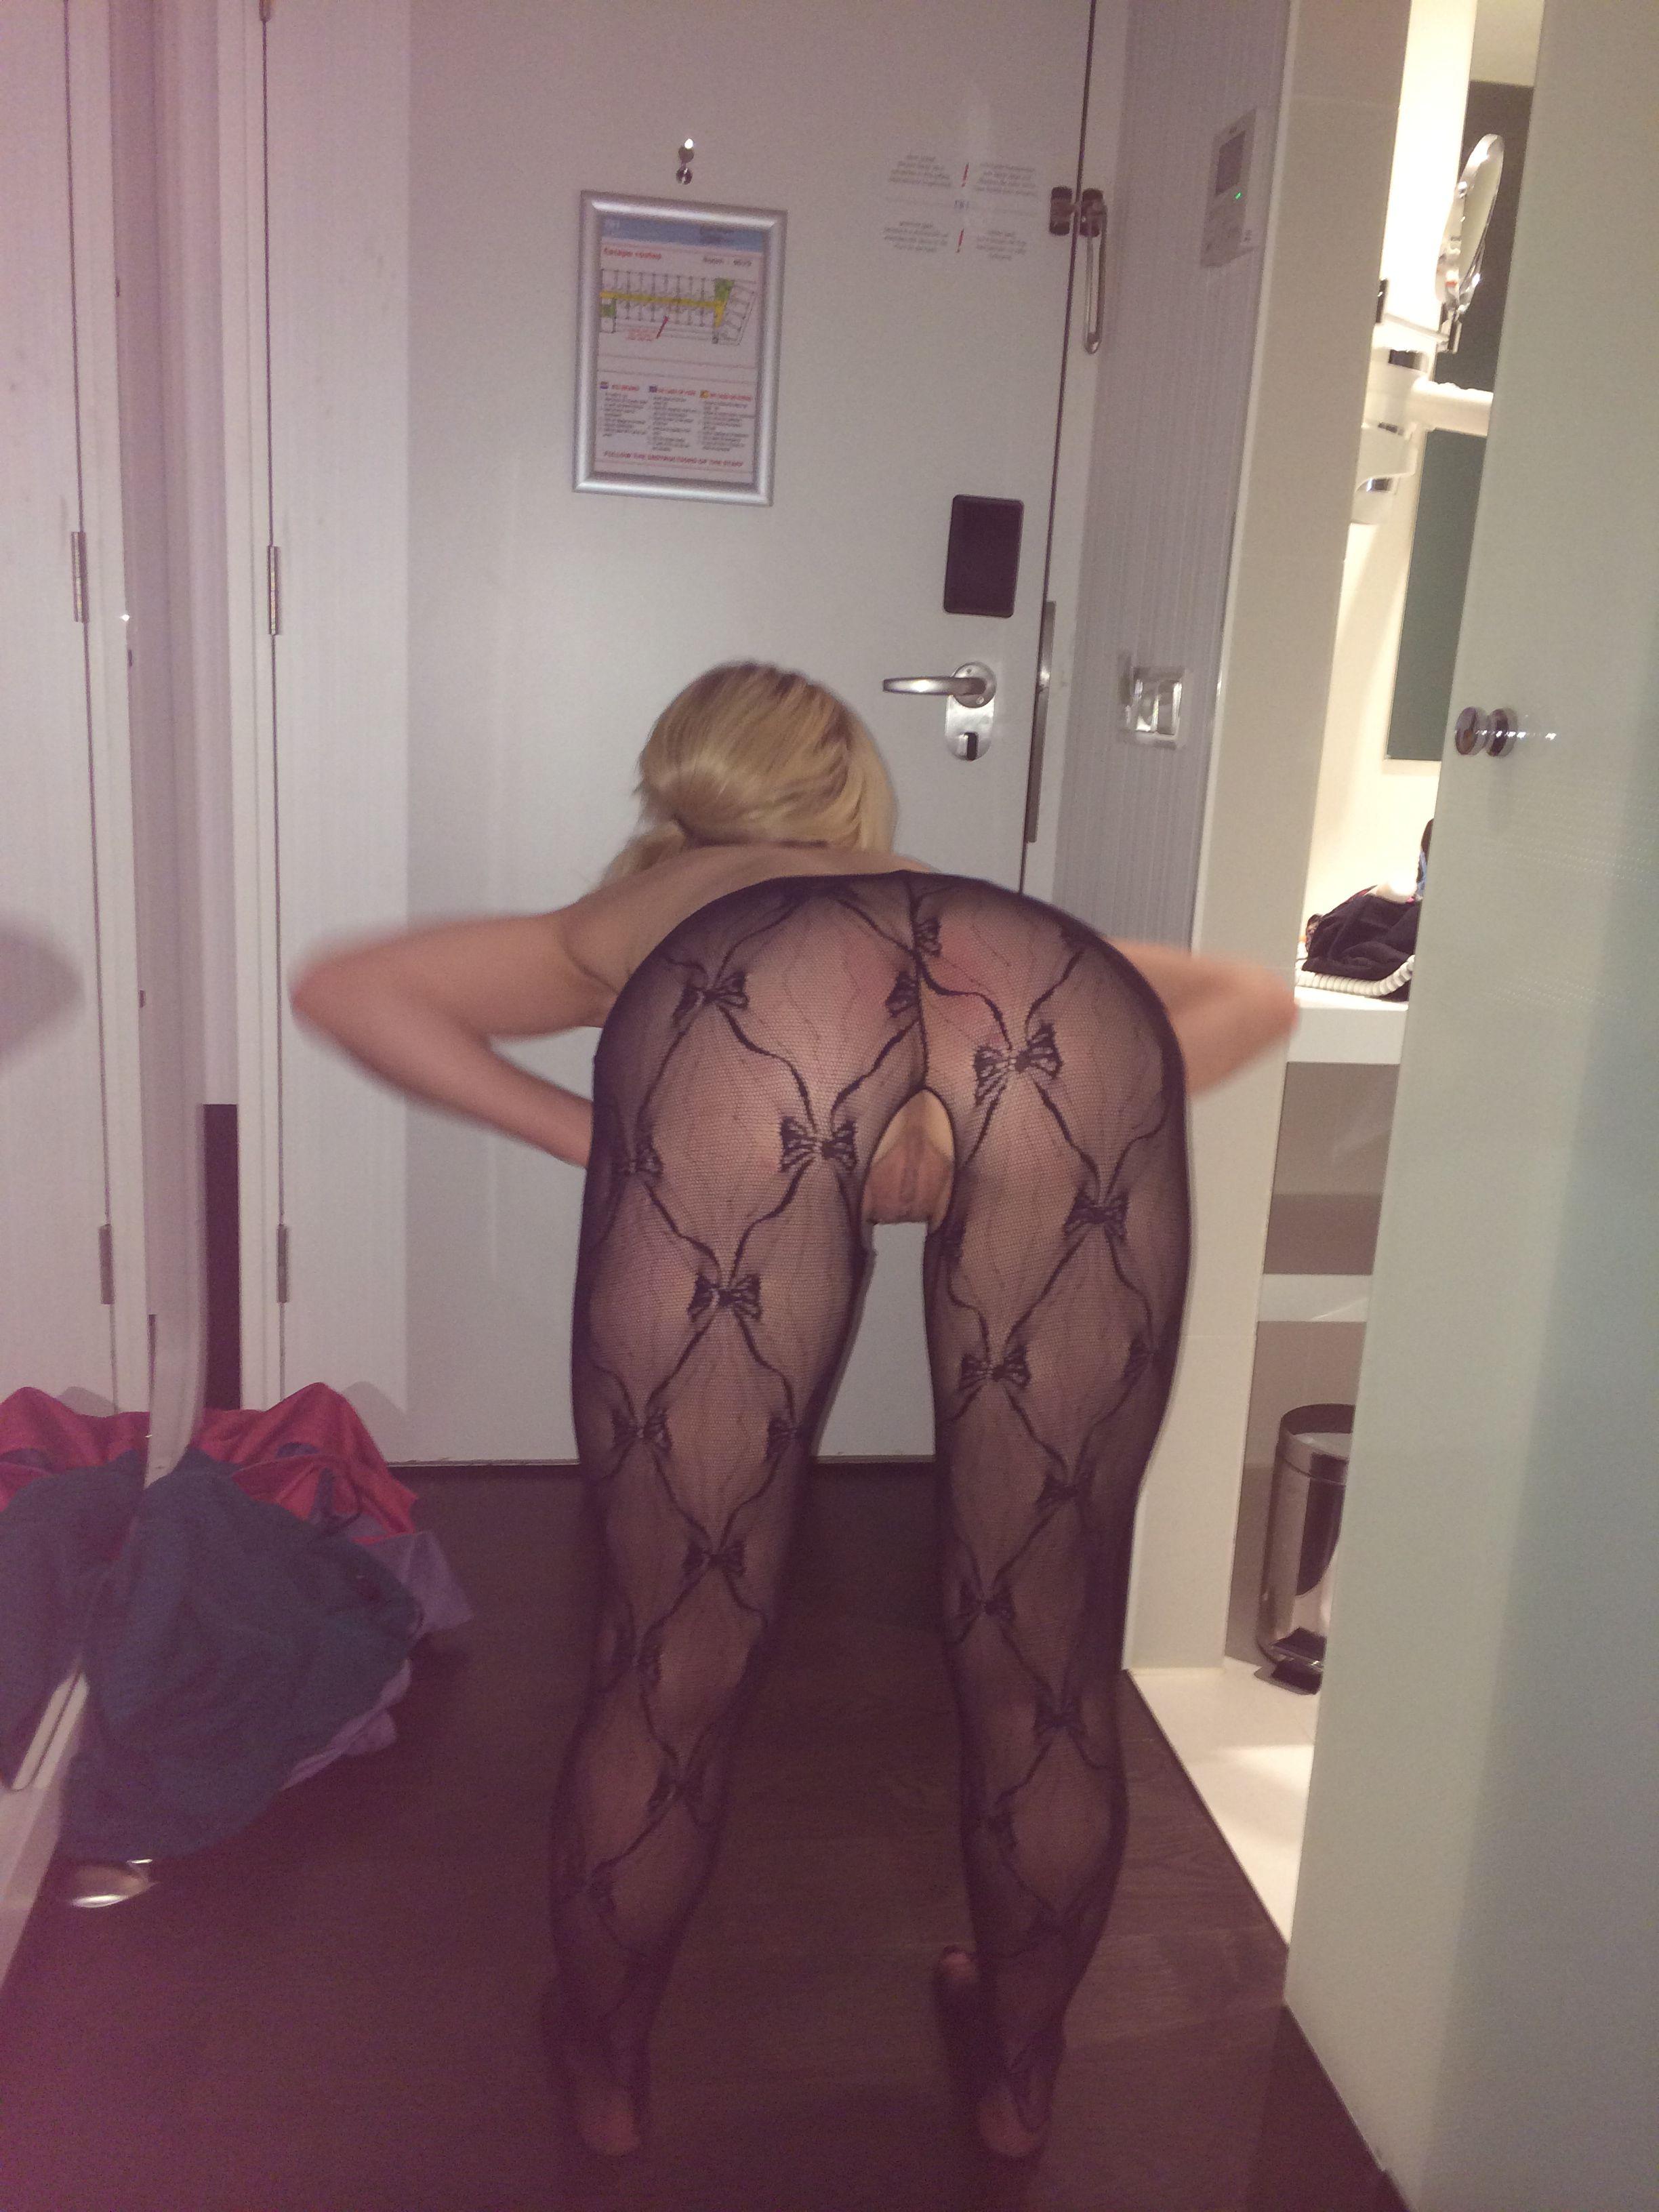 Porno Charlotte McKinney nude (64 photo), Sexy, Sideboobs, Instagram, braless 2020